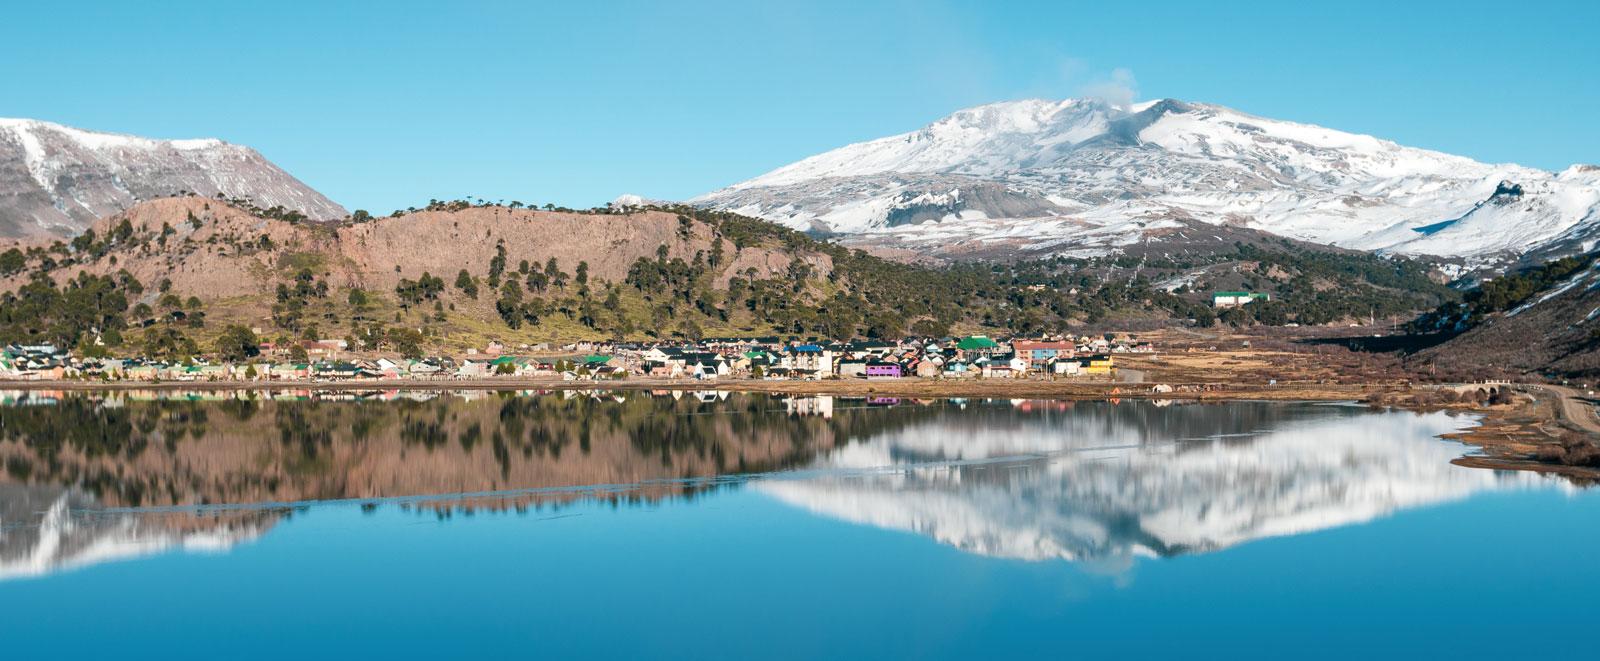 The town of Cavihavue. Photo Courtesy: Ben Girardi - Adventure in Argentina